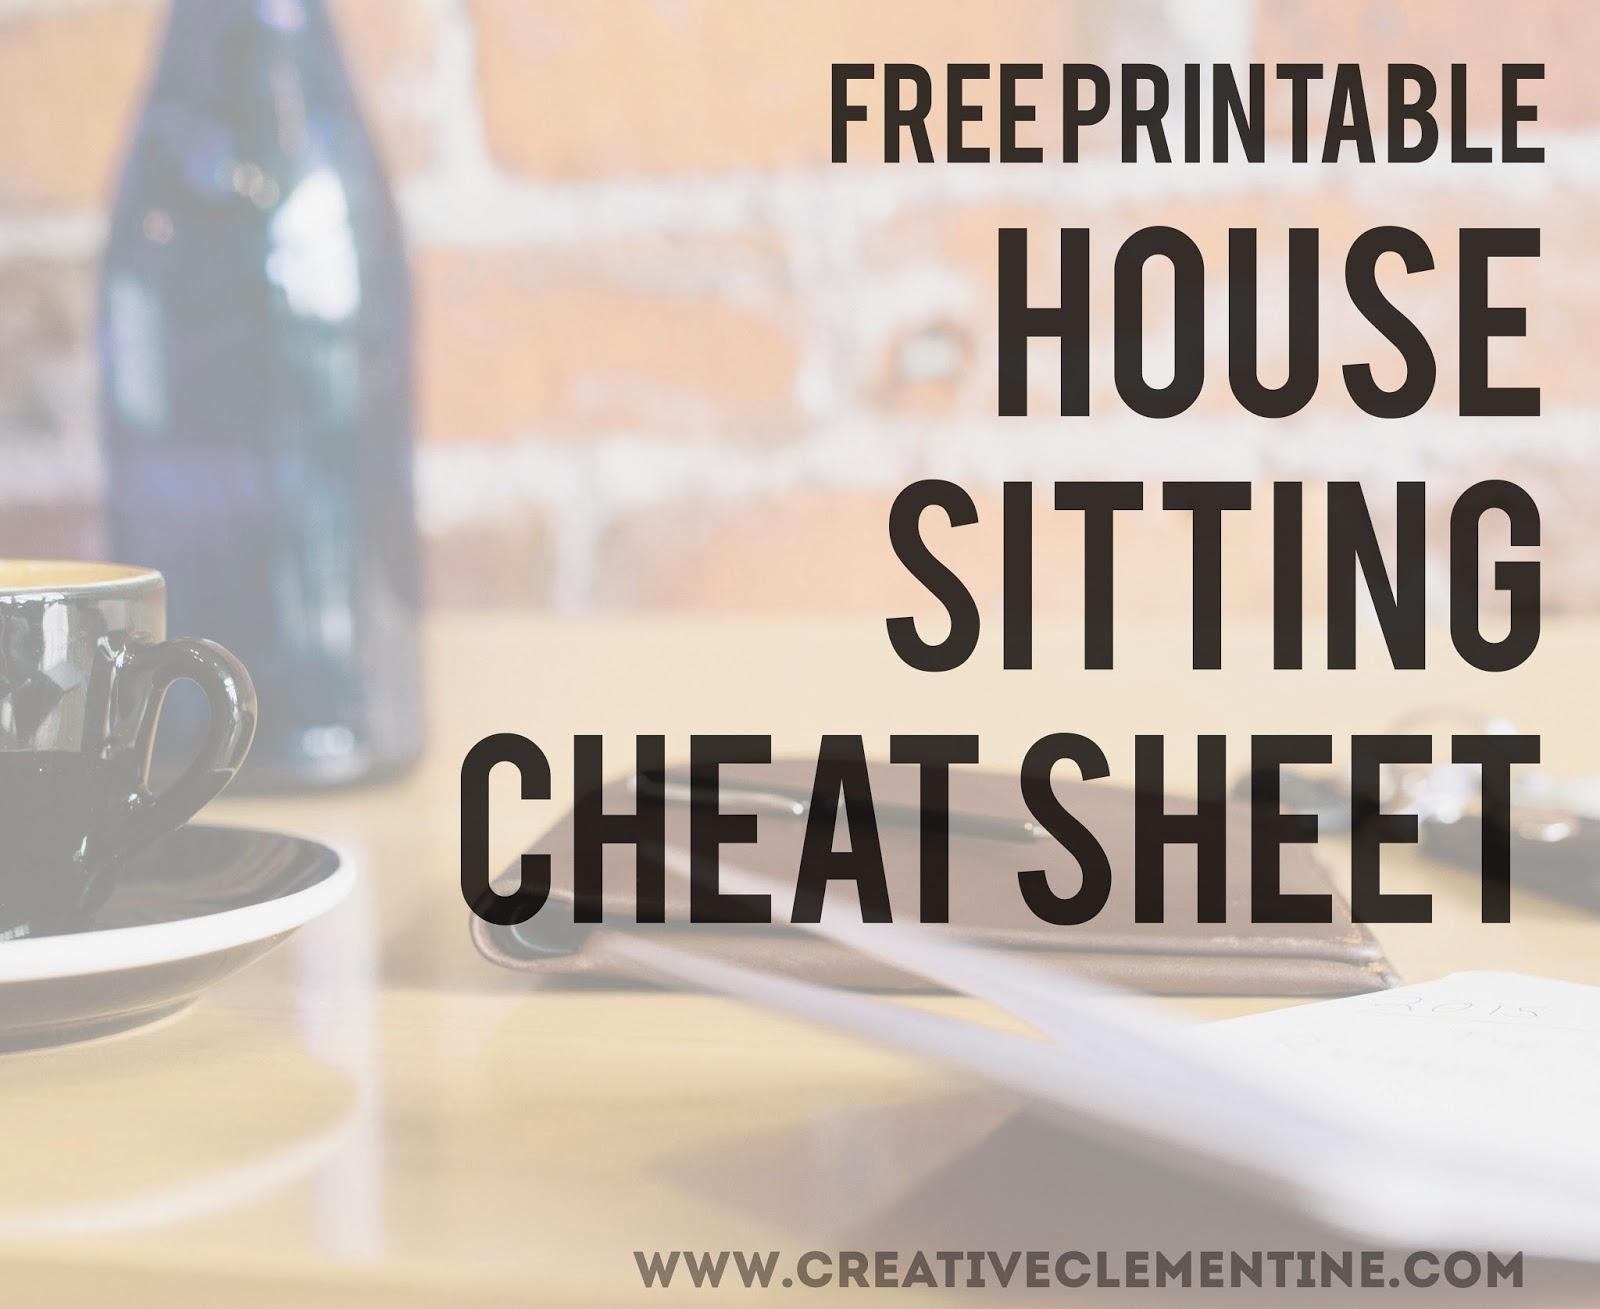 Free House Sitting Printable via Creative Clementine.com